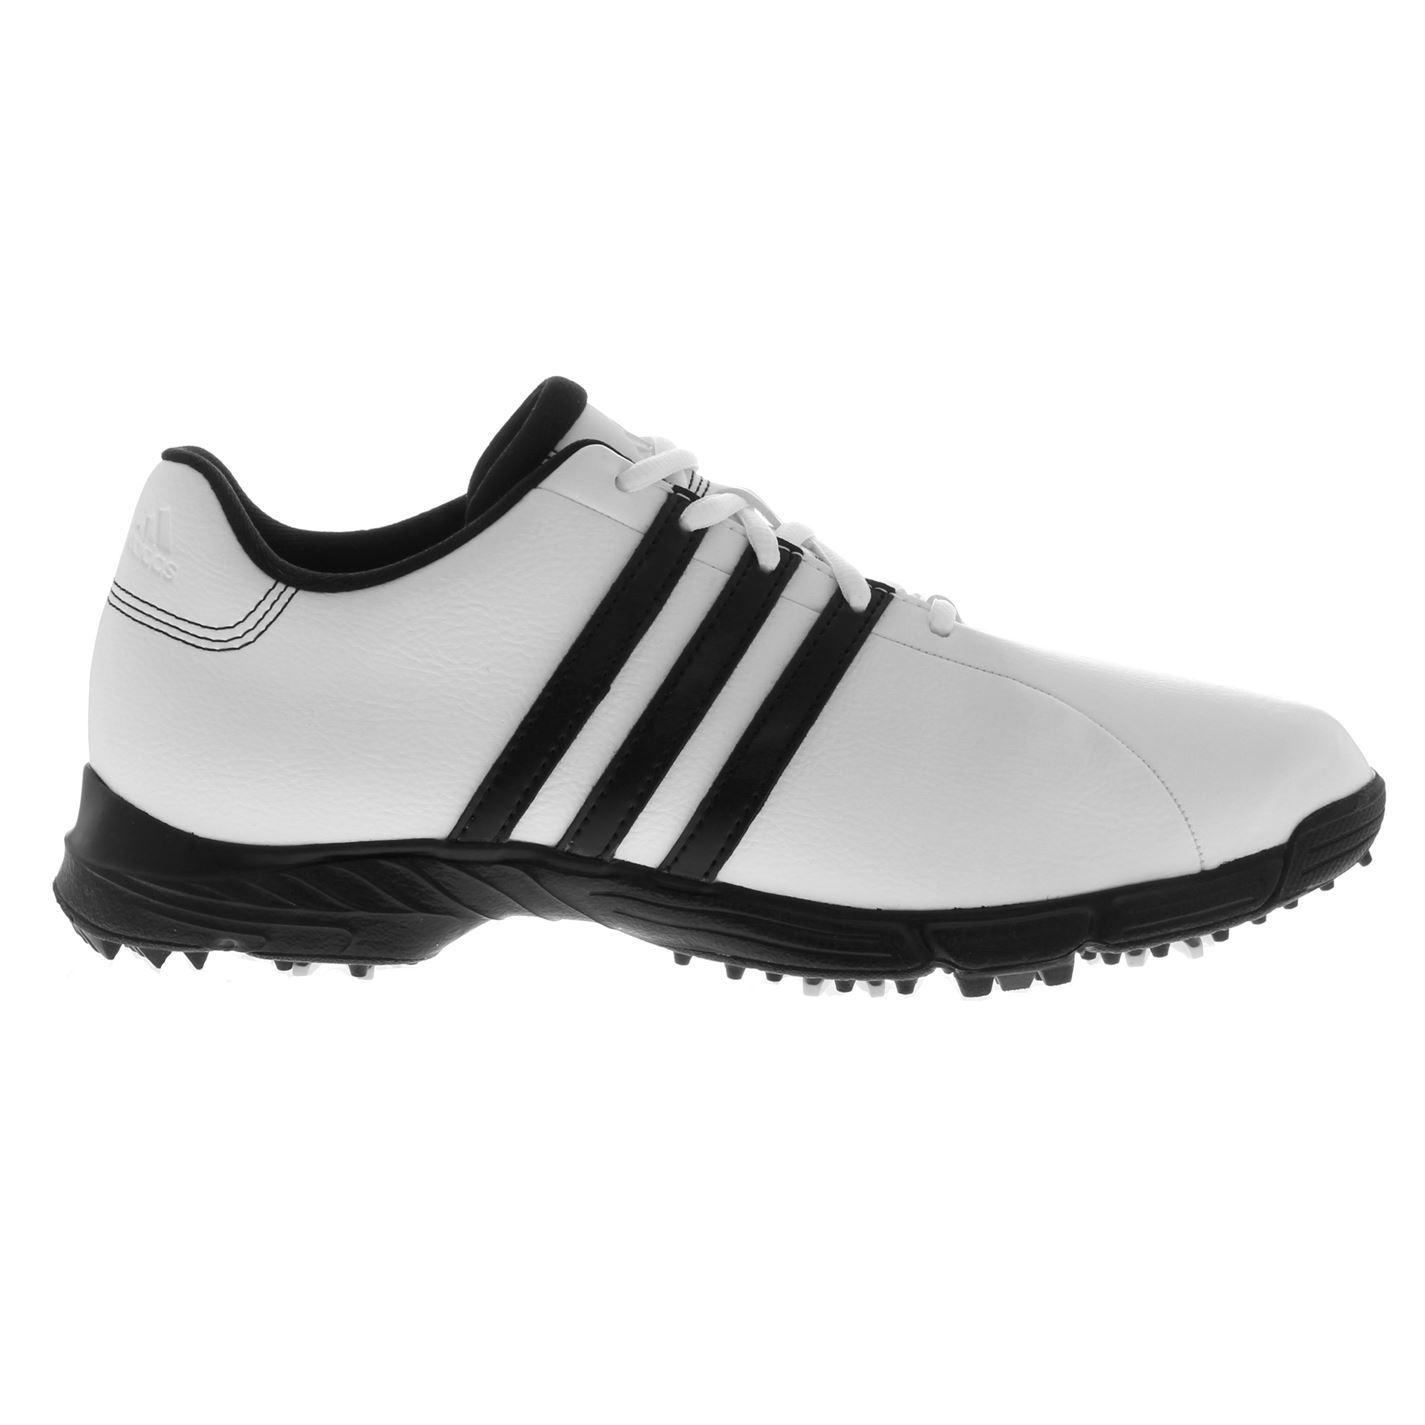 adidas-Golflite-Golf-Shoes-Mens-Spikes-Footwear thumbnail 20